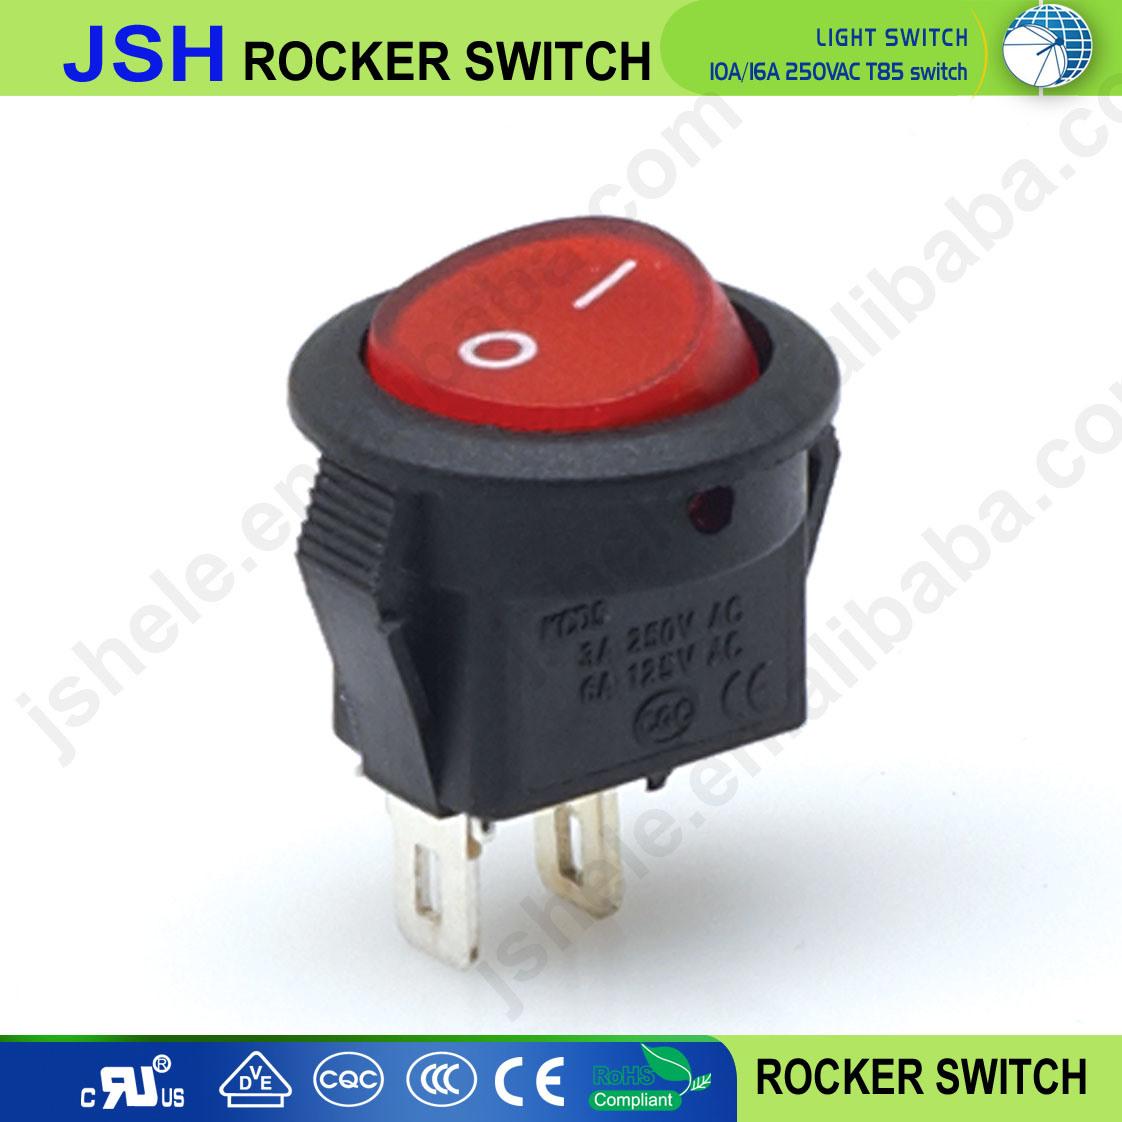 China Locking Round Circular Rocker Switch Car Dash Dashboard Boat Lighted Toggle Spst 25a 12v